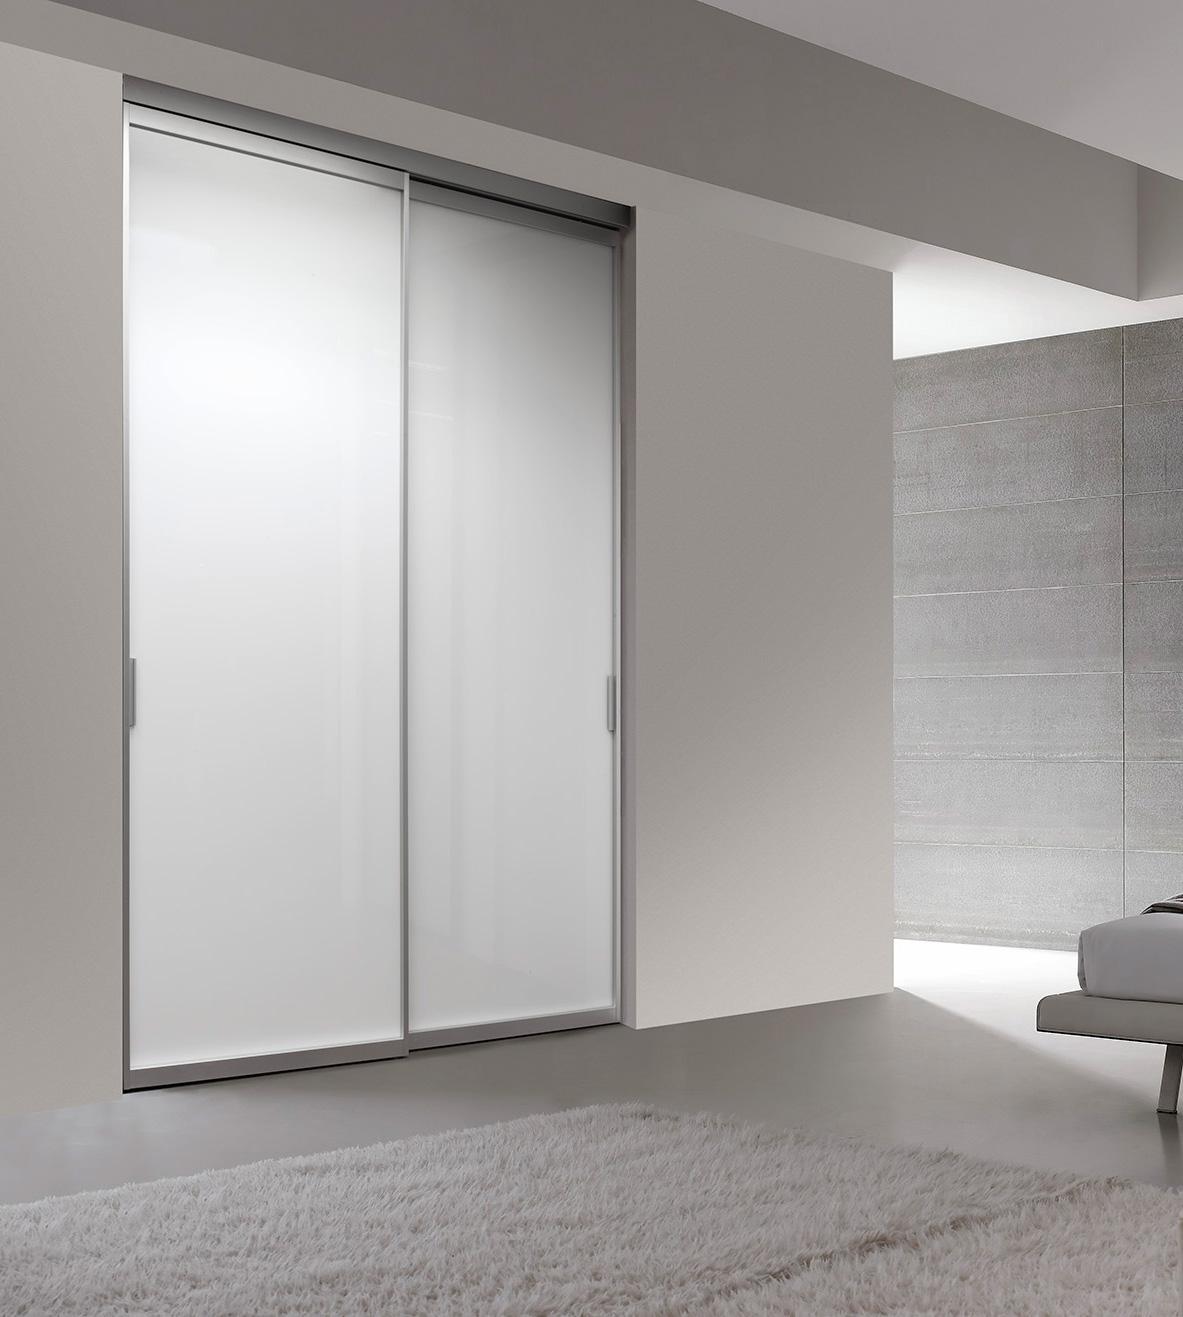 Cabine armadio e porte - Porte scorrevoli per cabina armadio ...